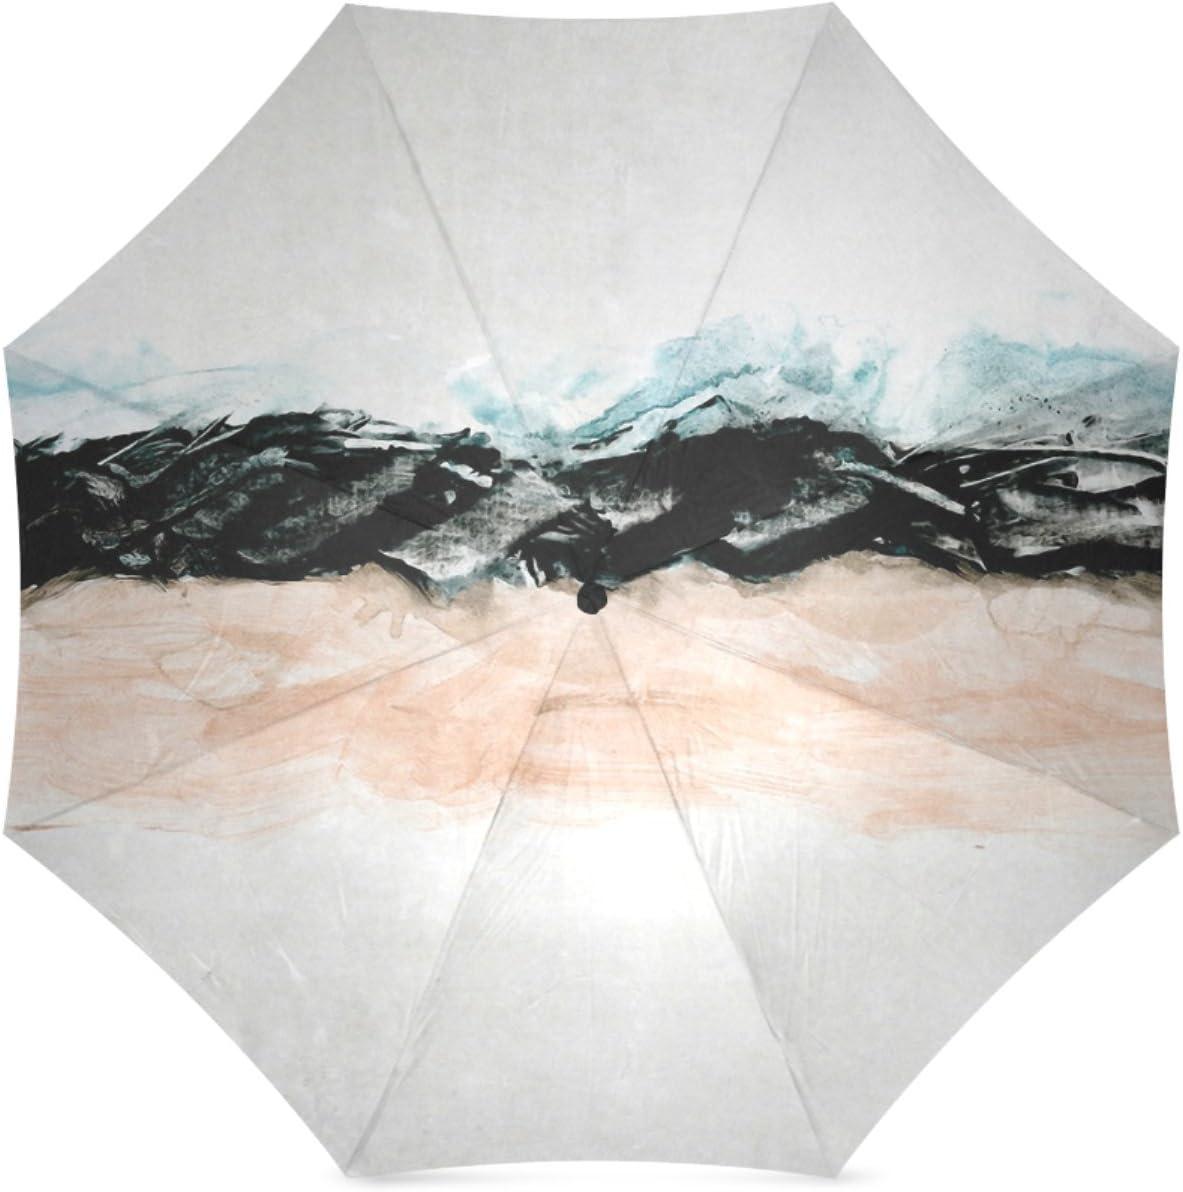 Beautytool Customized Abstract Minimalist Landscape Folding Travel Umbrella